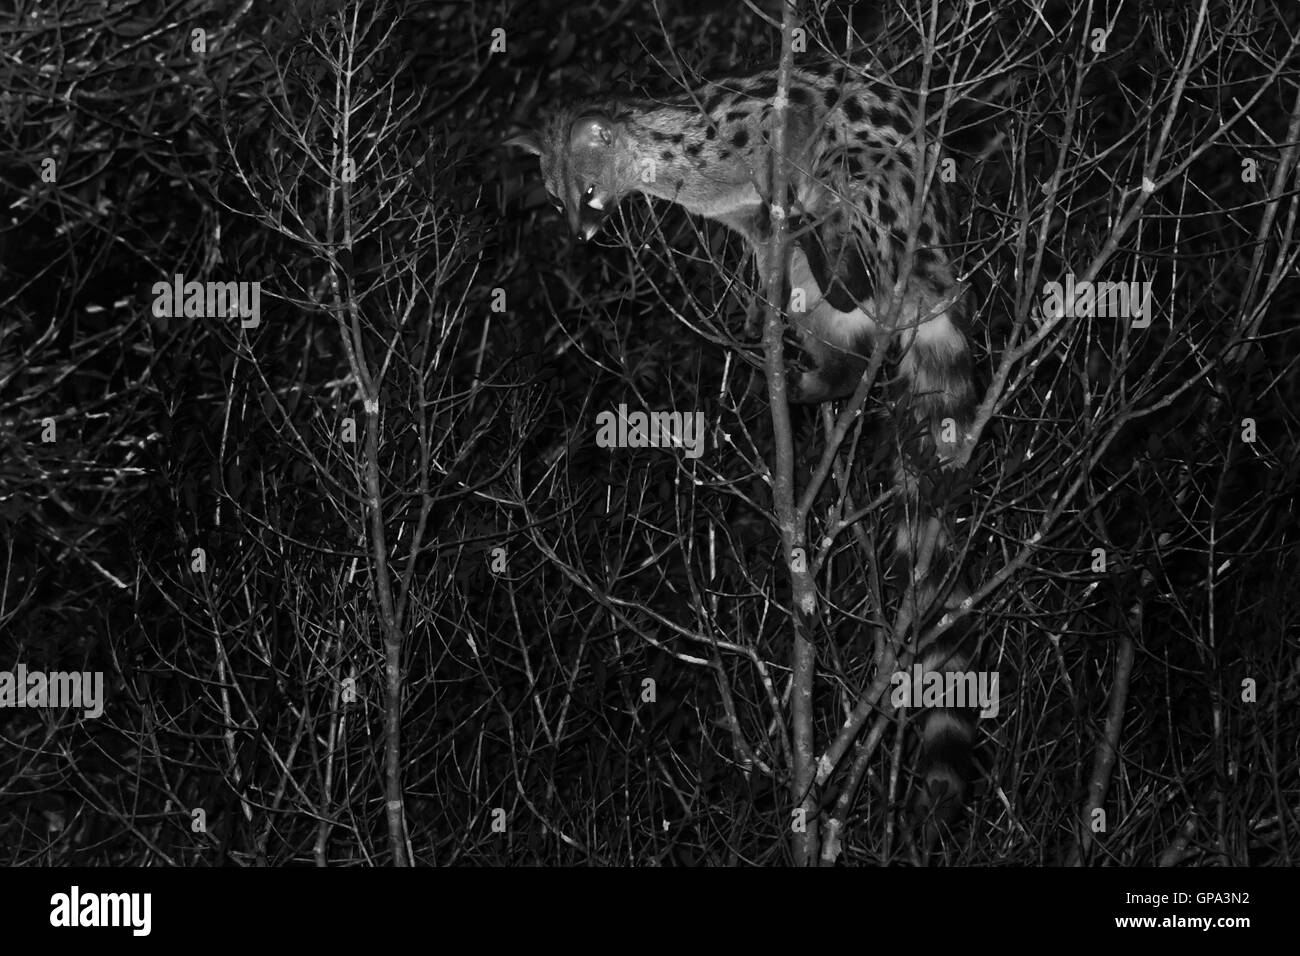 Common Genet (Genetta genetta) climbing on a tree at night - Stock Image